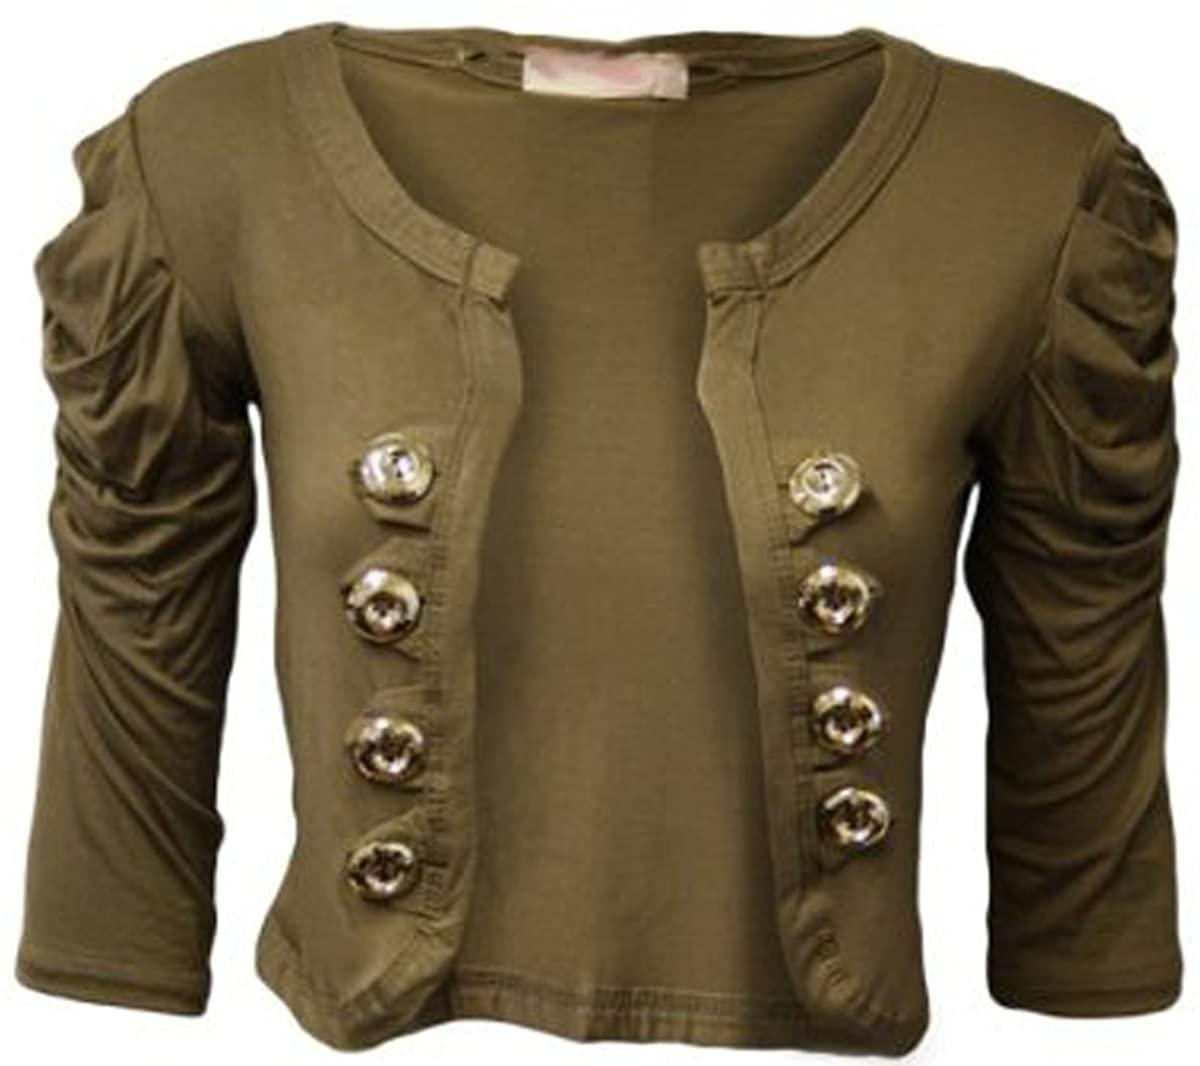 FashionMark Womens Plain Short Sleeves Military Style Button Bolero Shrug Cardigan Top